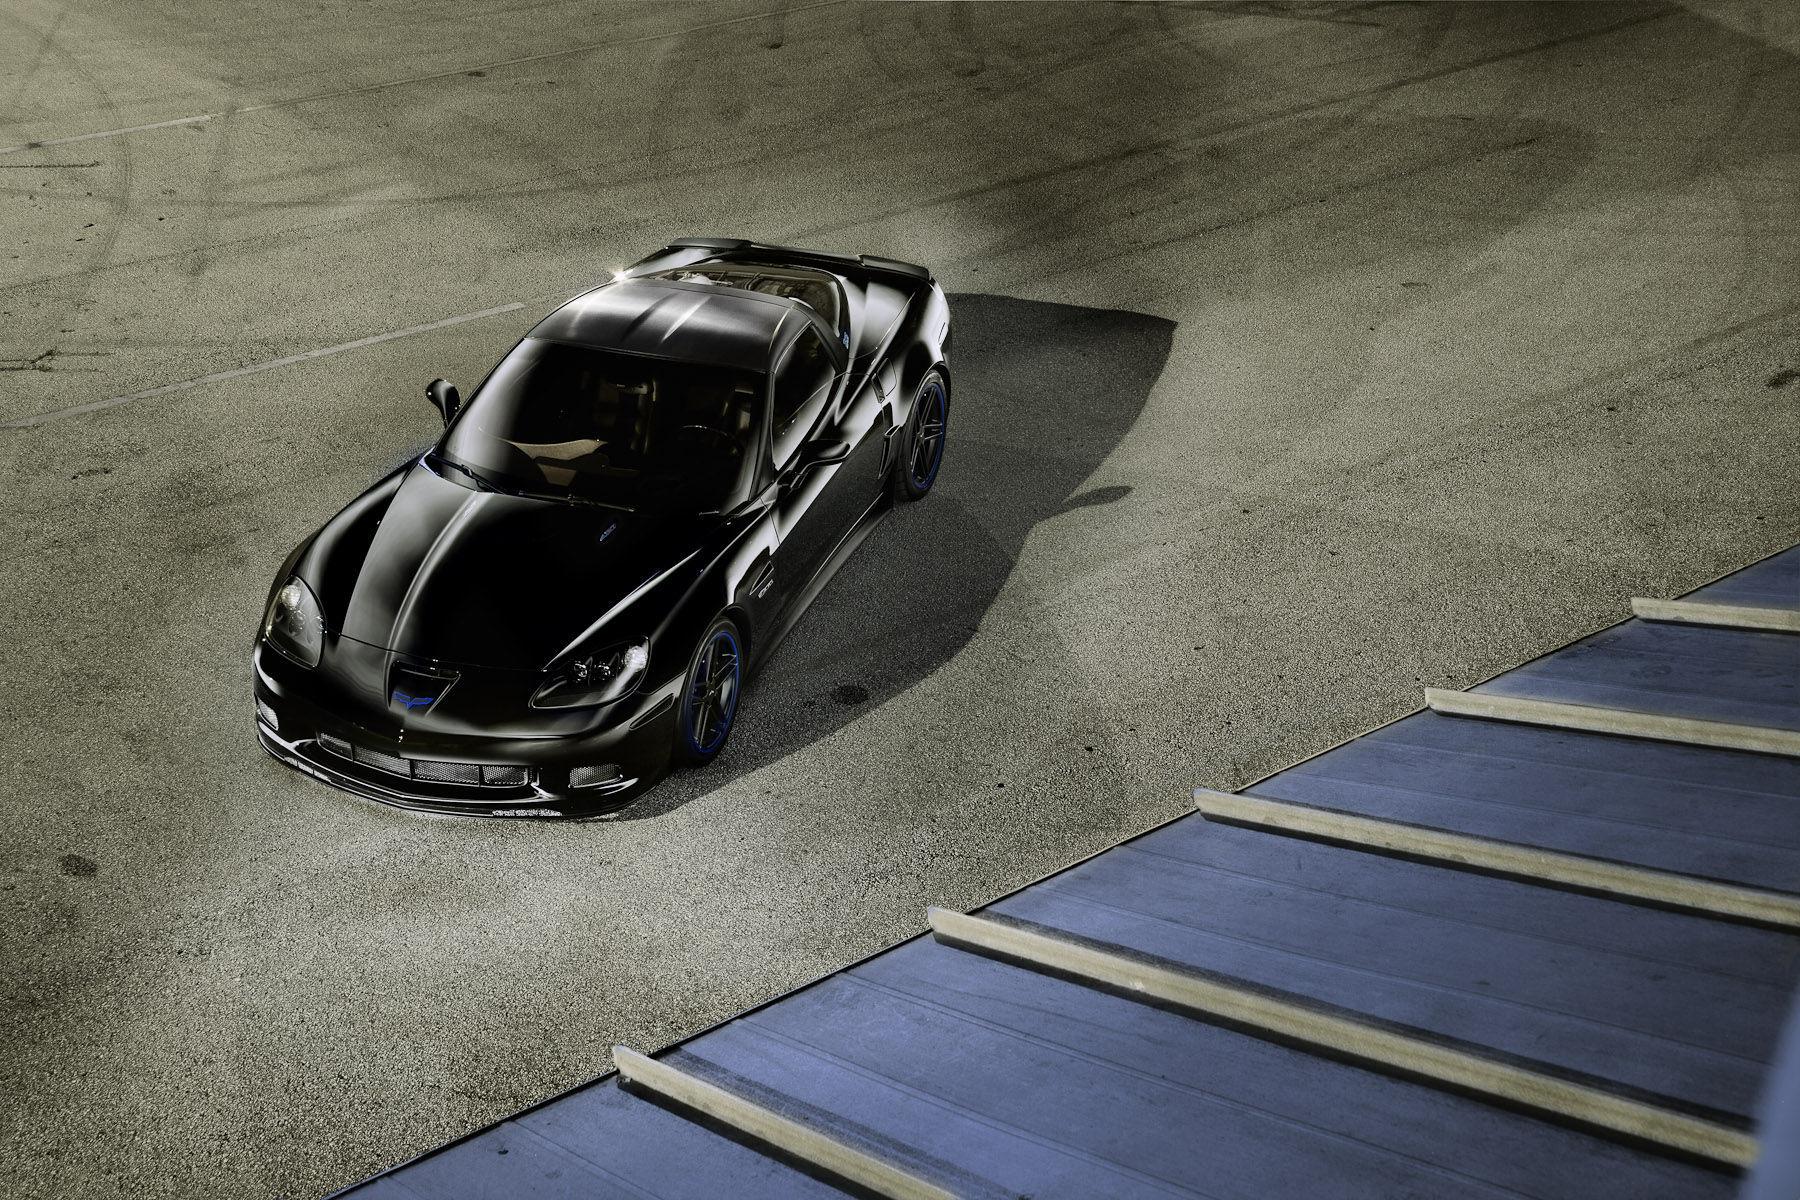 2006 Chevrolet Corvette   Black Z06